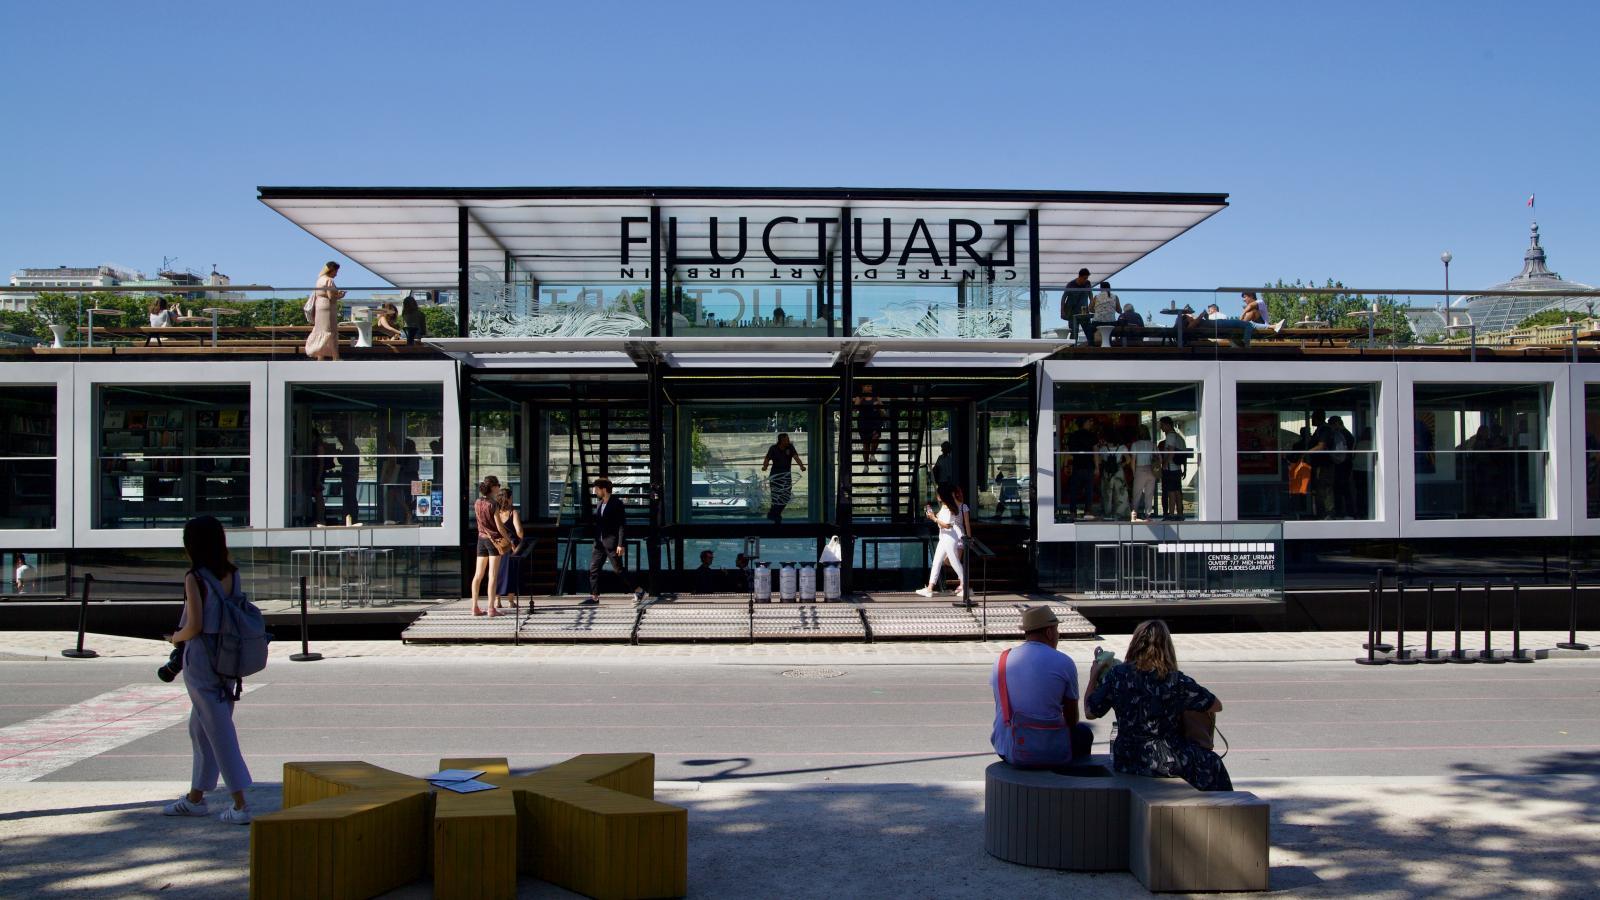 Fluctuart; the new Parisian centre dedicated to urban art